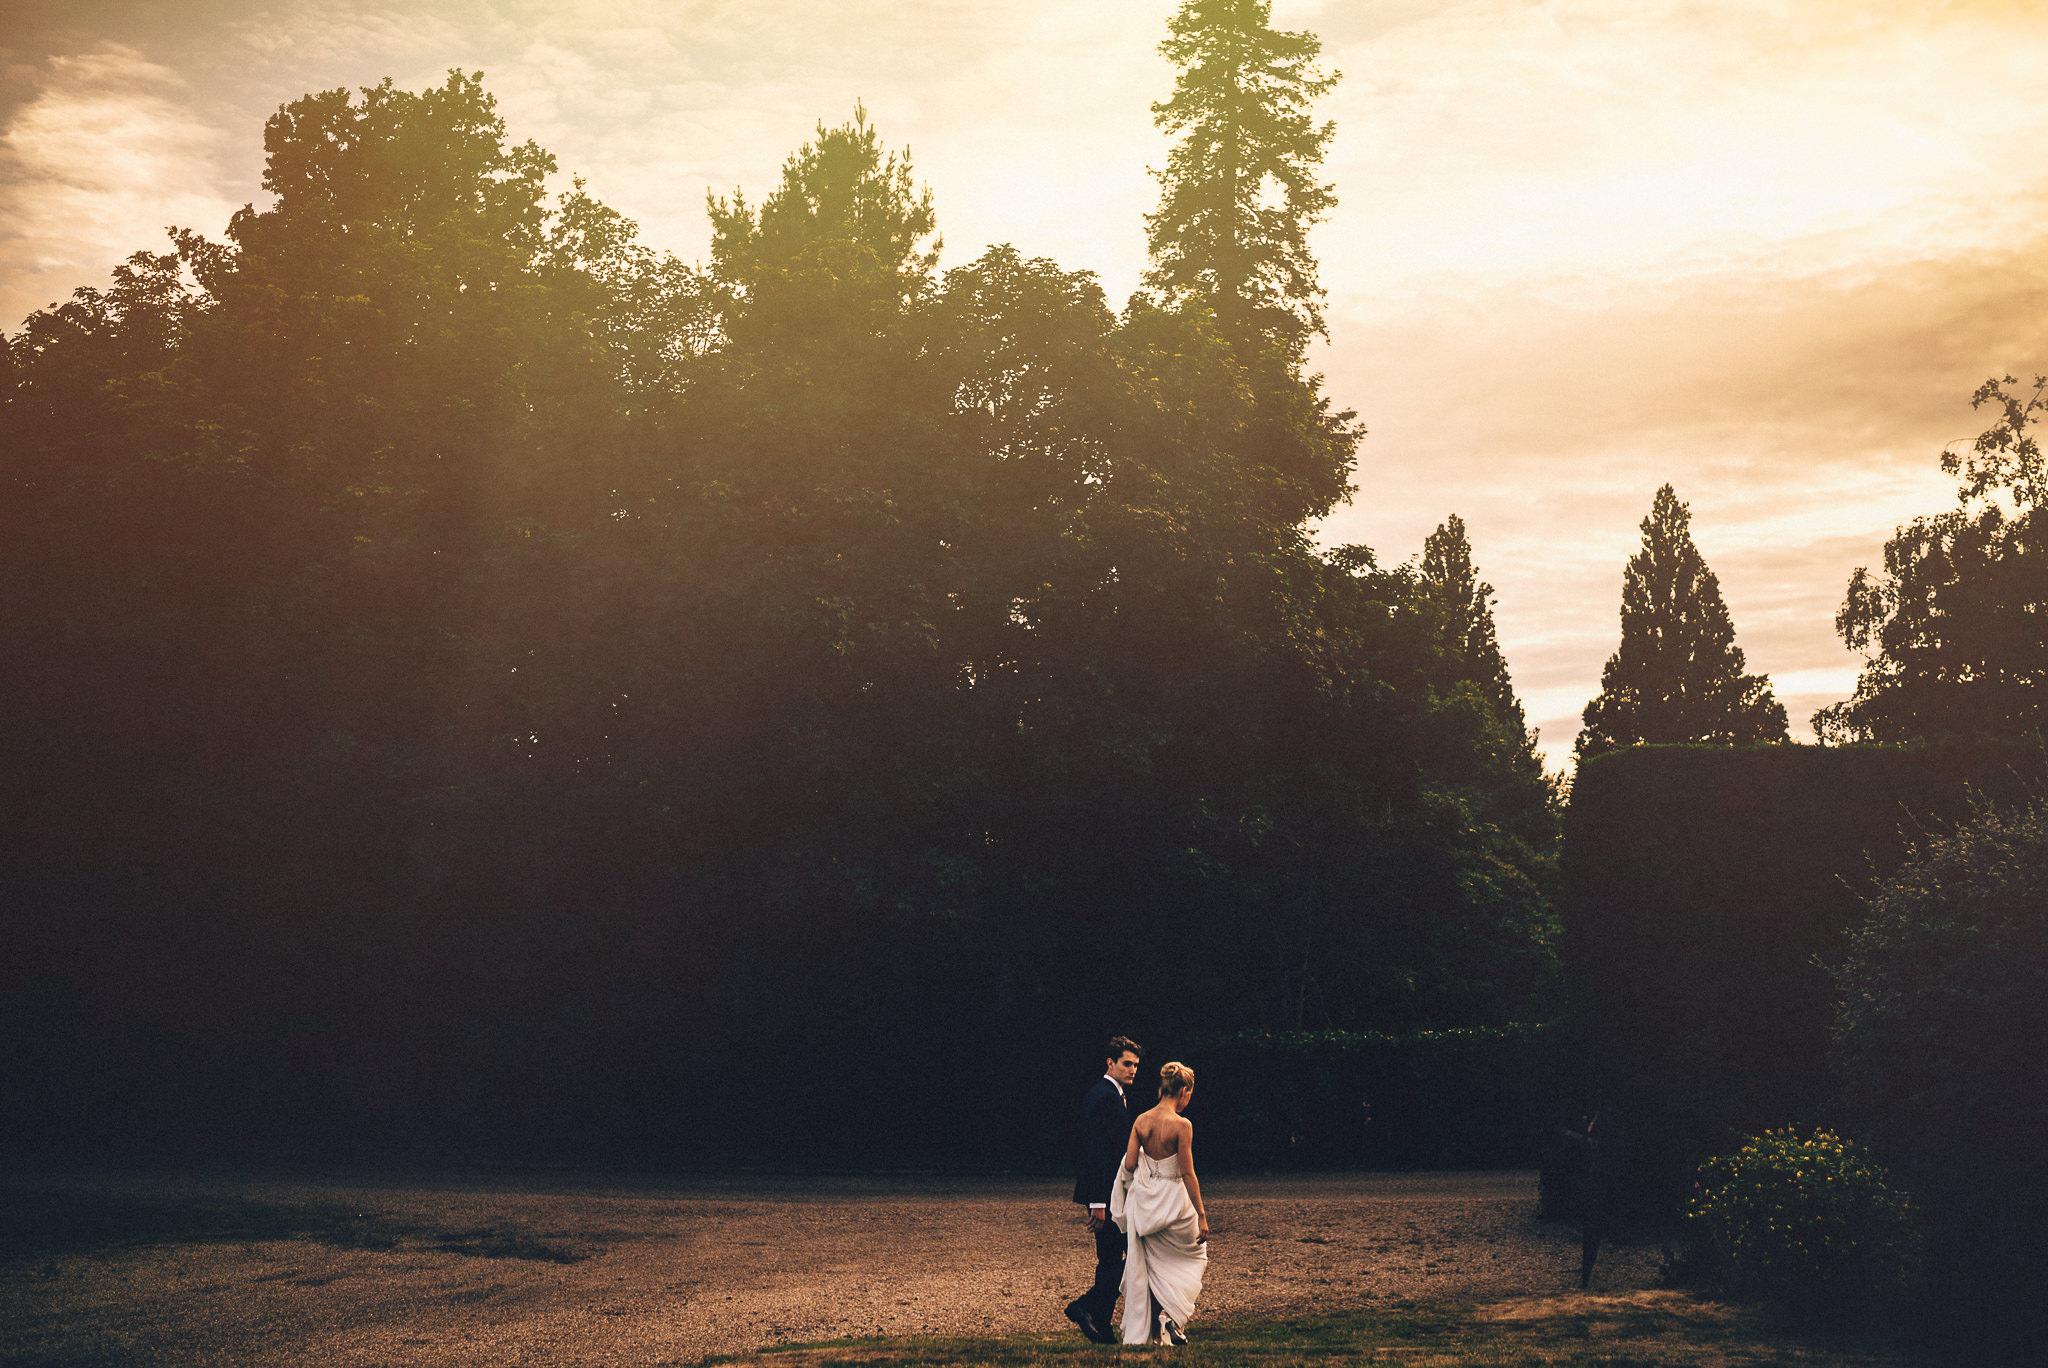 paul-marbrook-Gaynes-Park Wedding-Photographer-90136